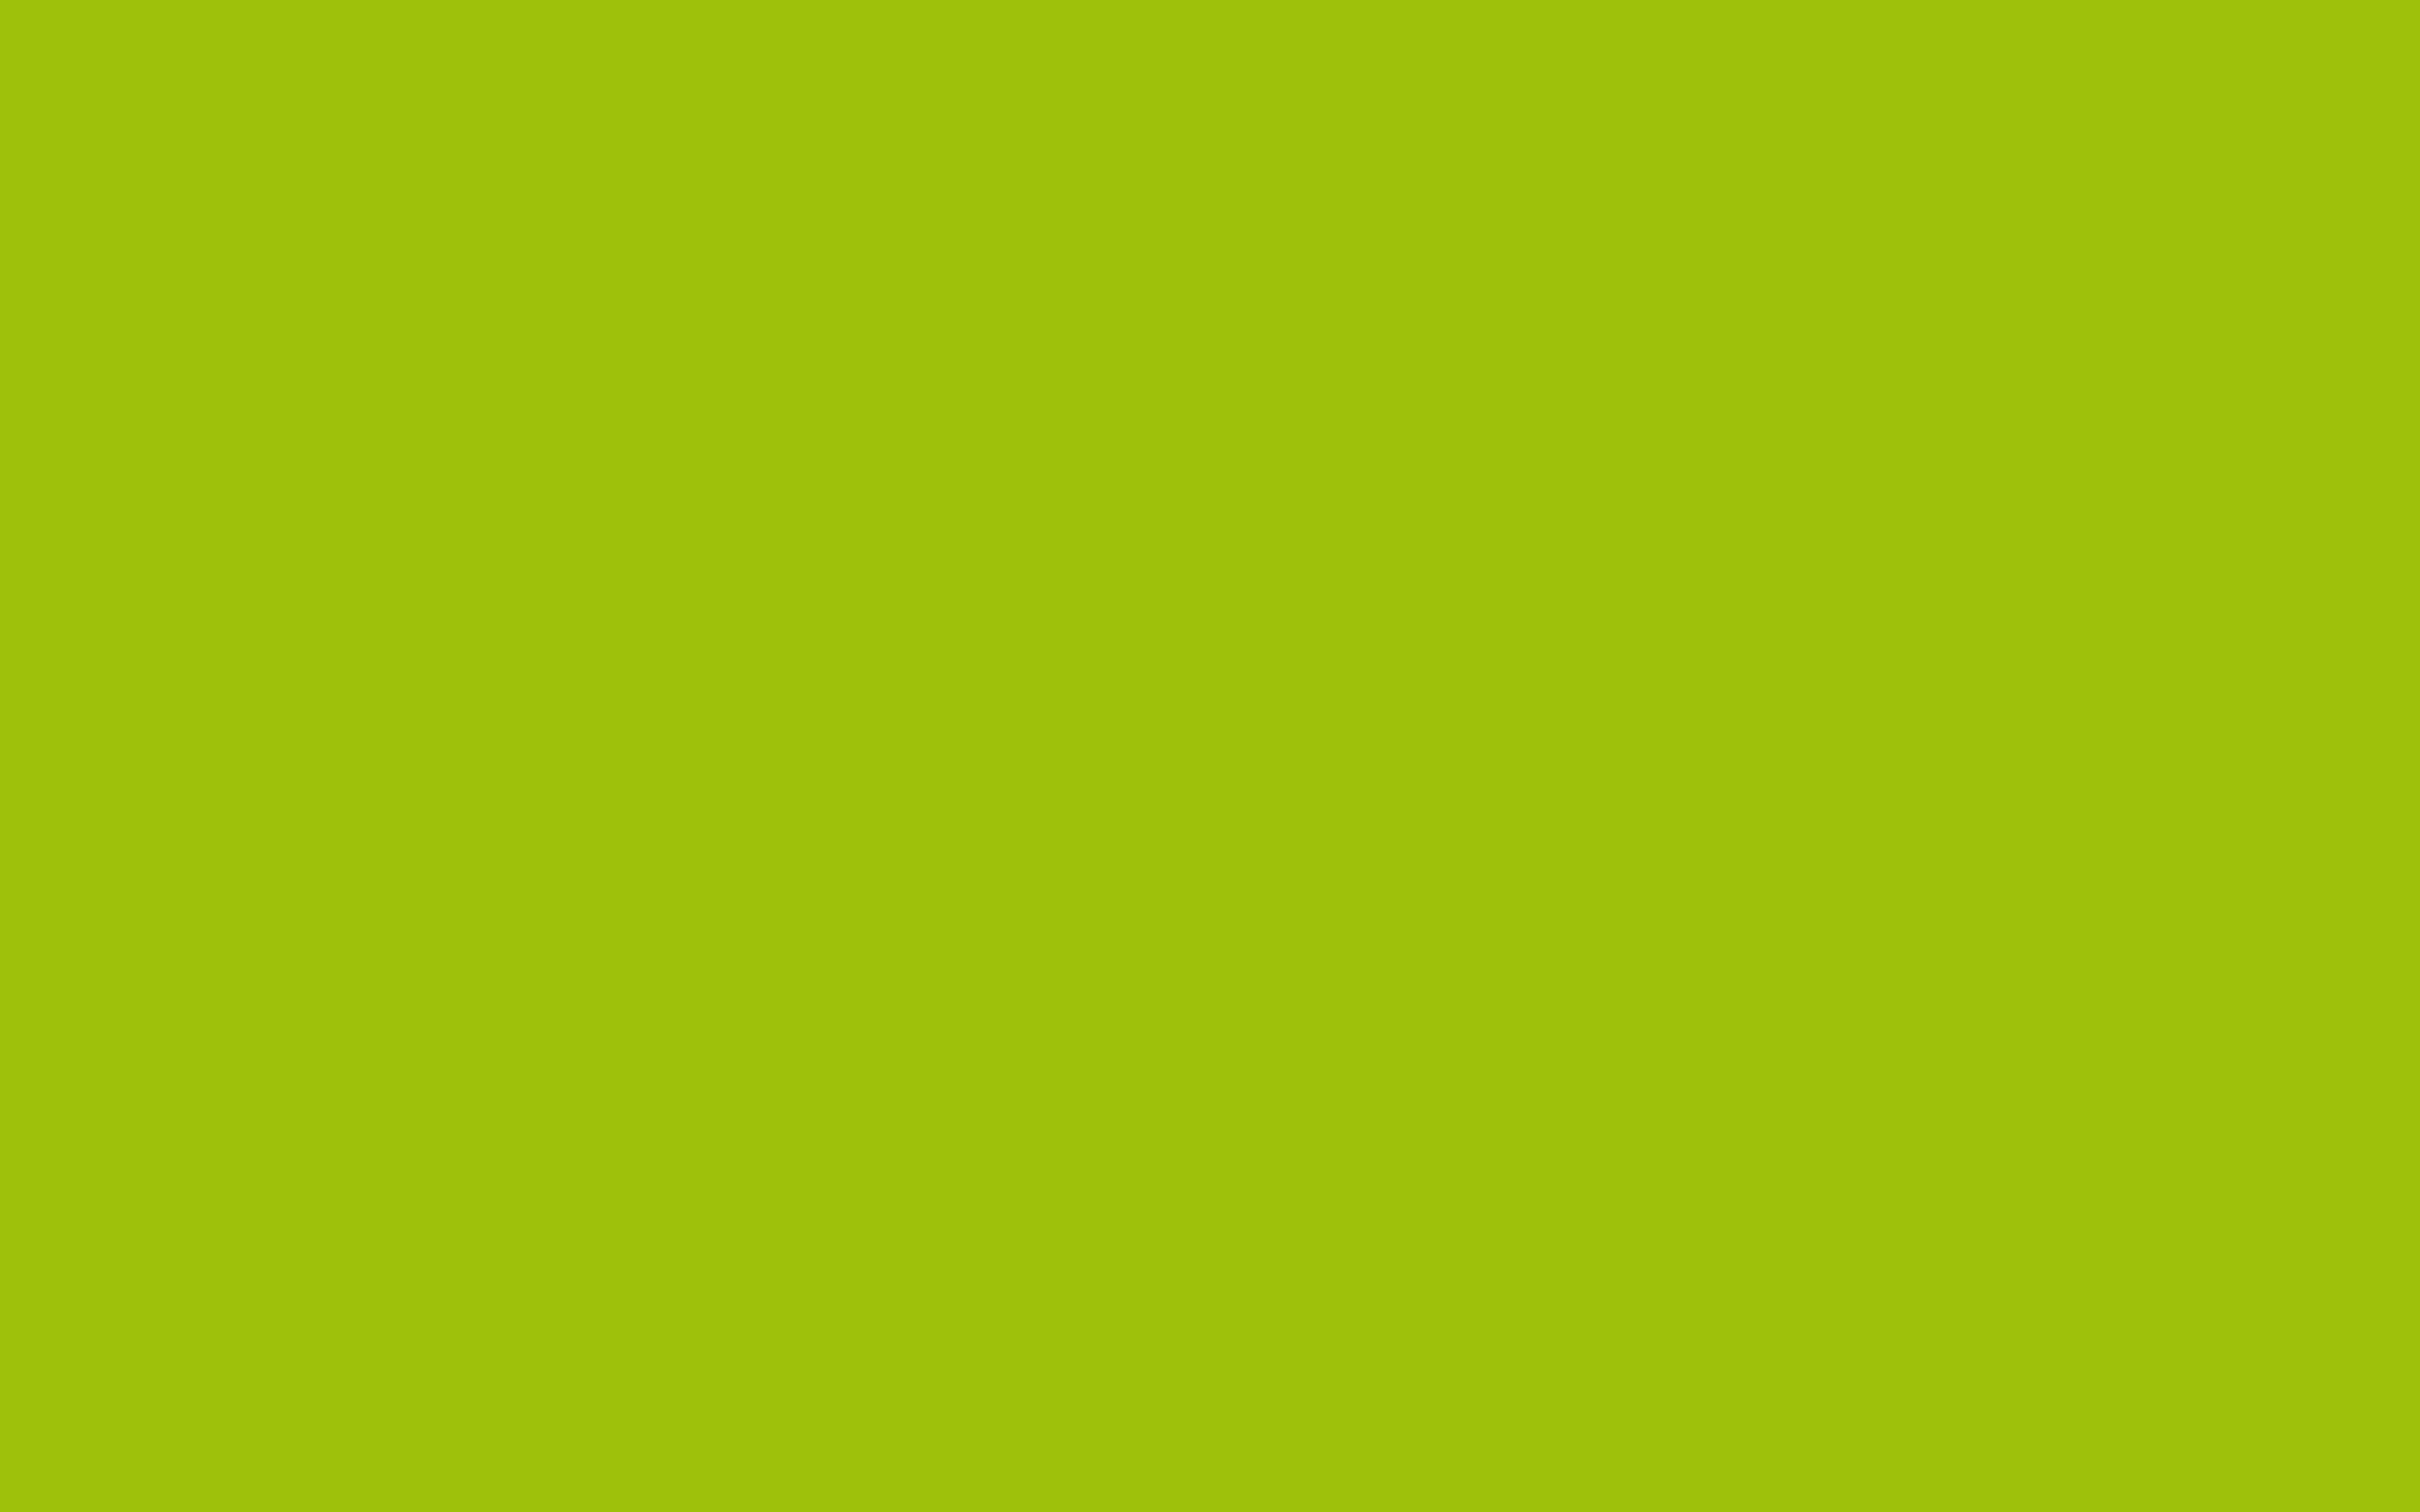 2560x1600 Limerick Solid Color Background